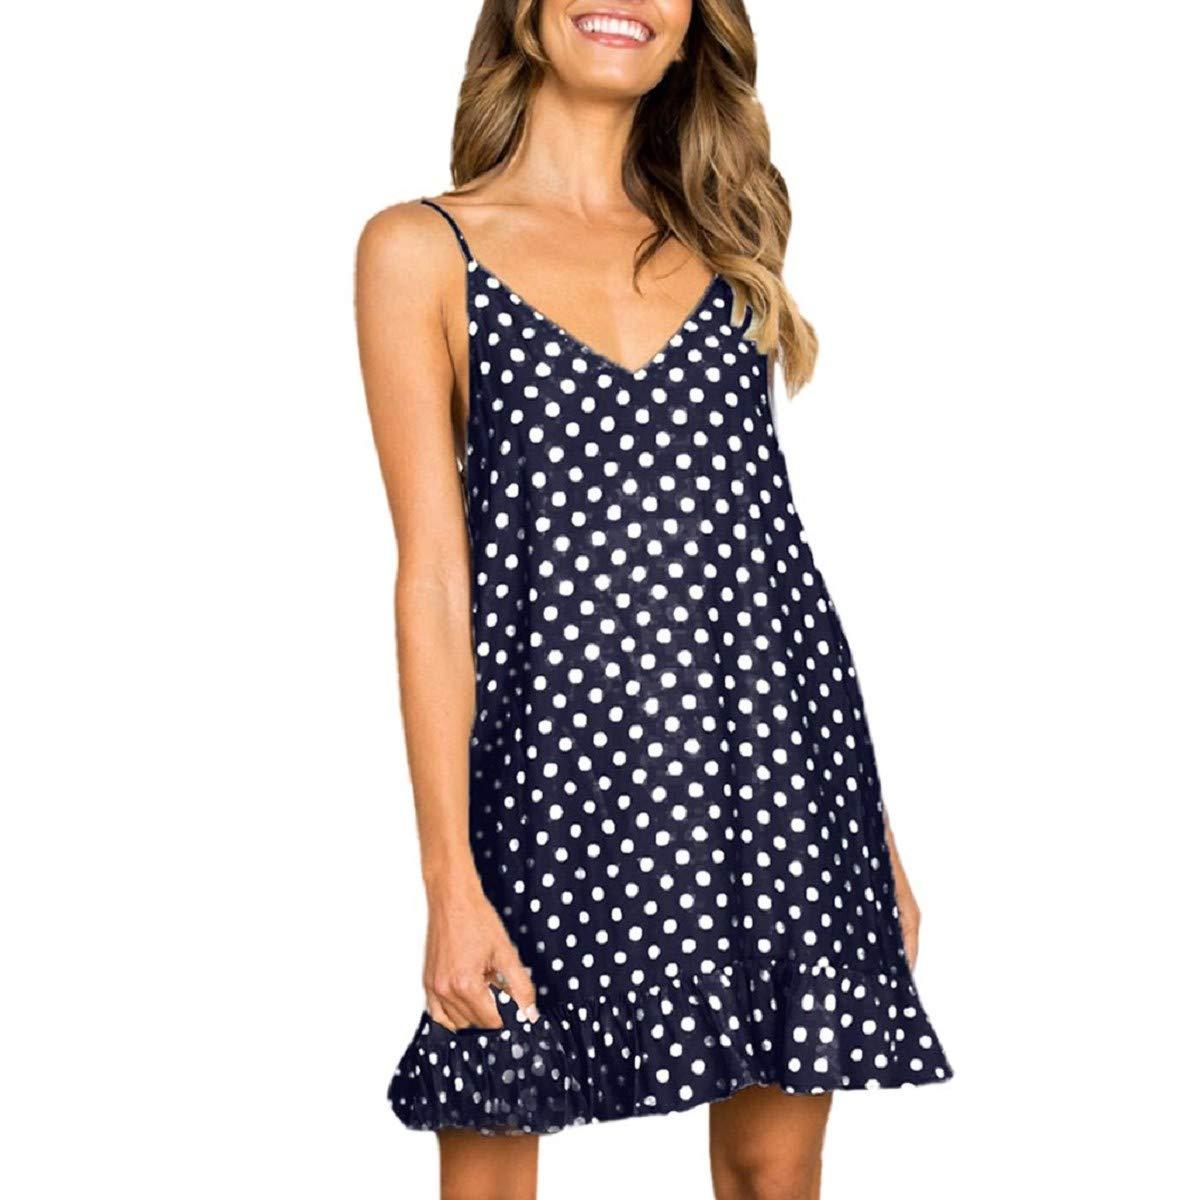 OTINICE Women's Summer Casual Sleeveless V-Neck Dot Printed Swing Dress Sleepwear Nightdress Dark Blue